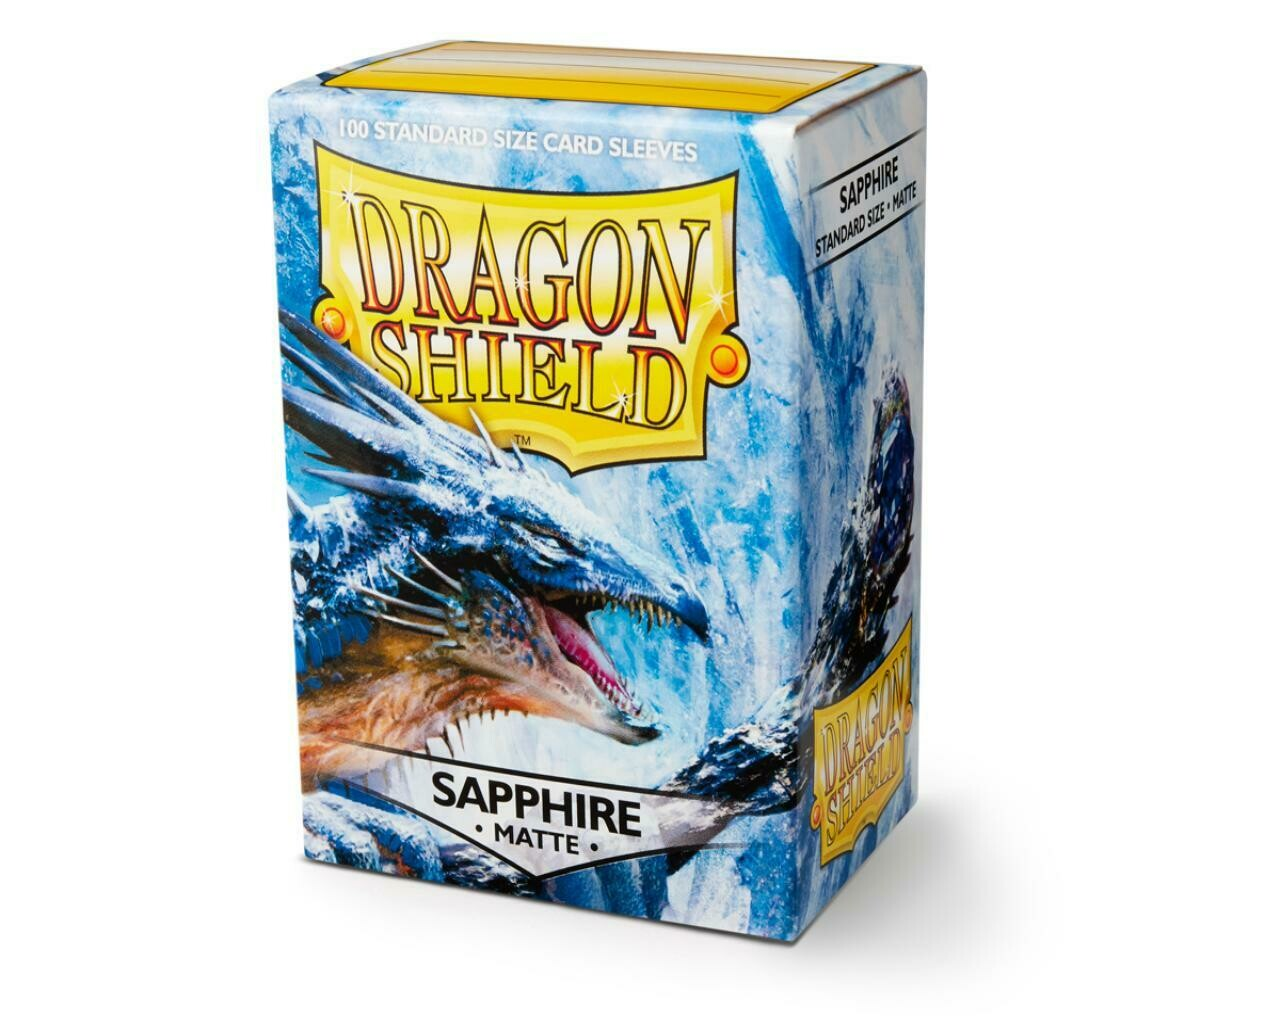 Dragon Shield 100 Sleeves - Matte Sapphire